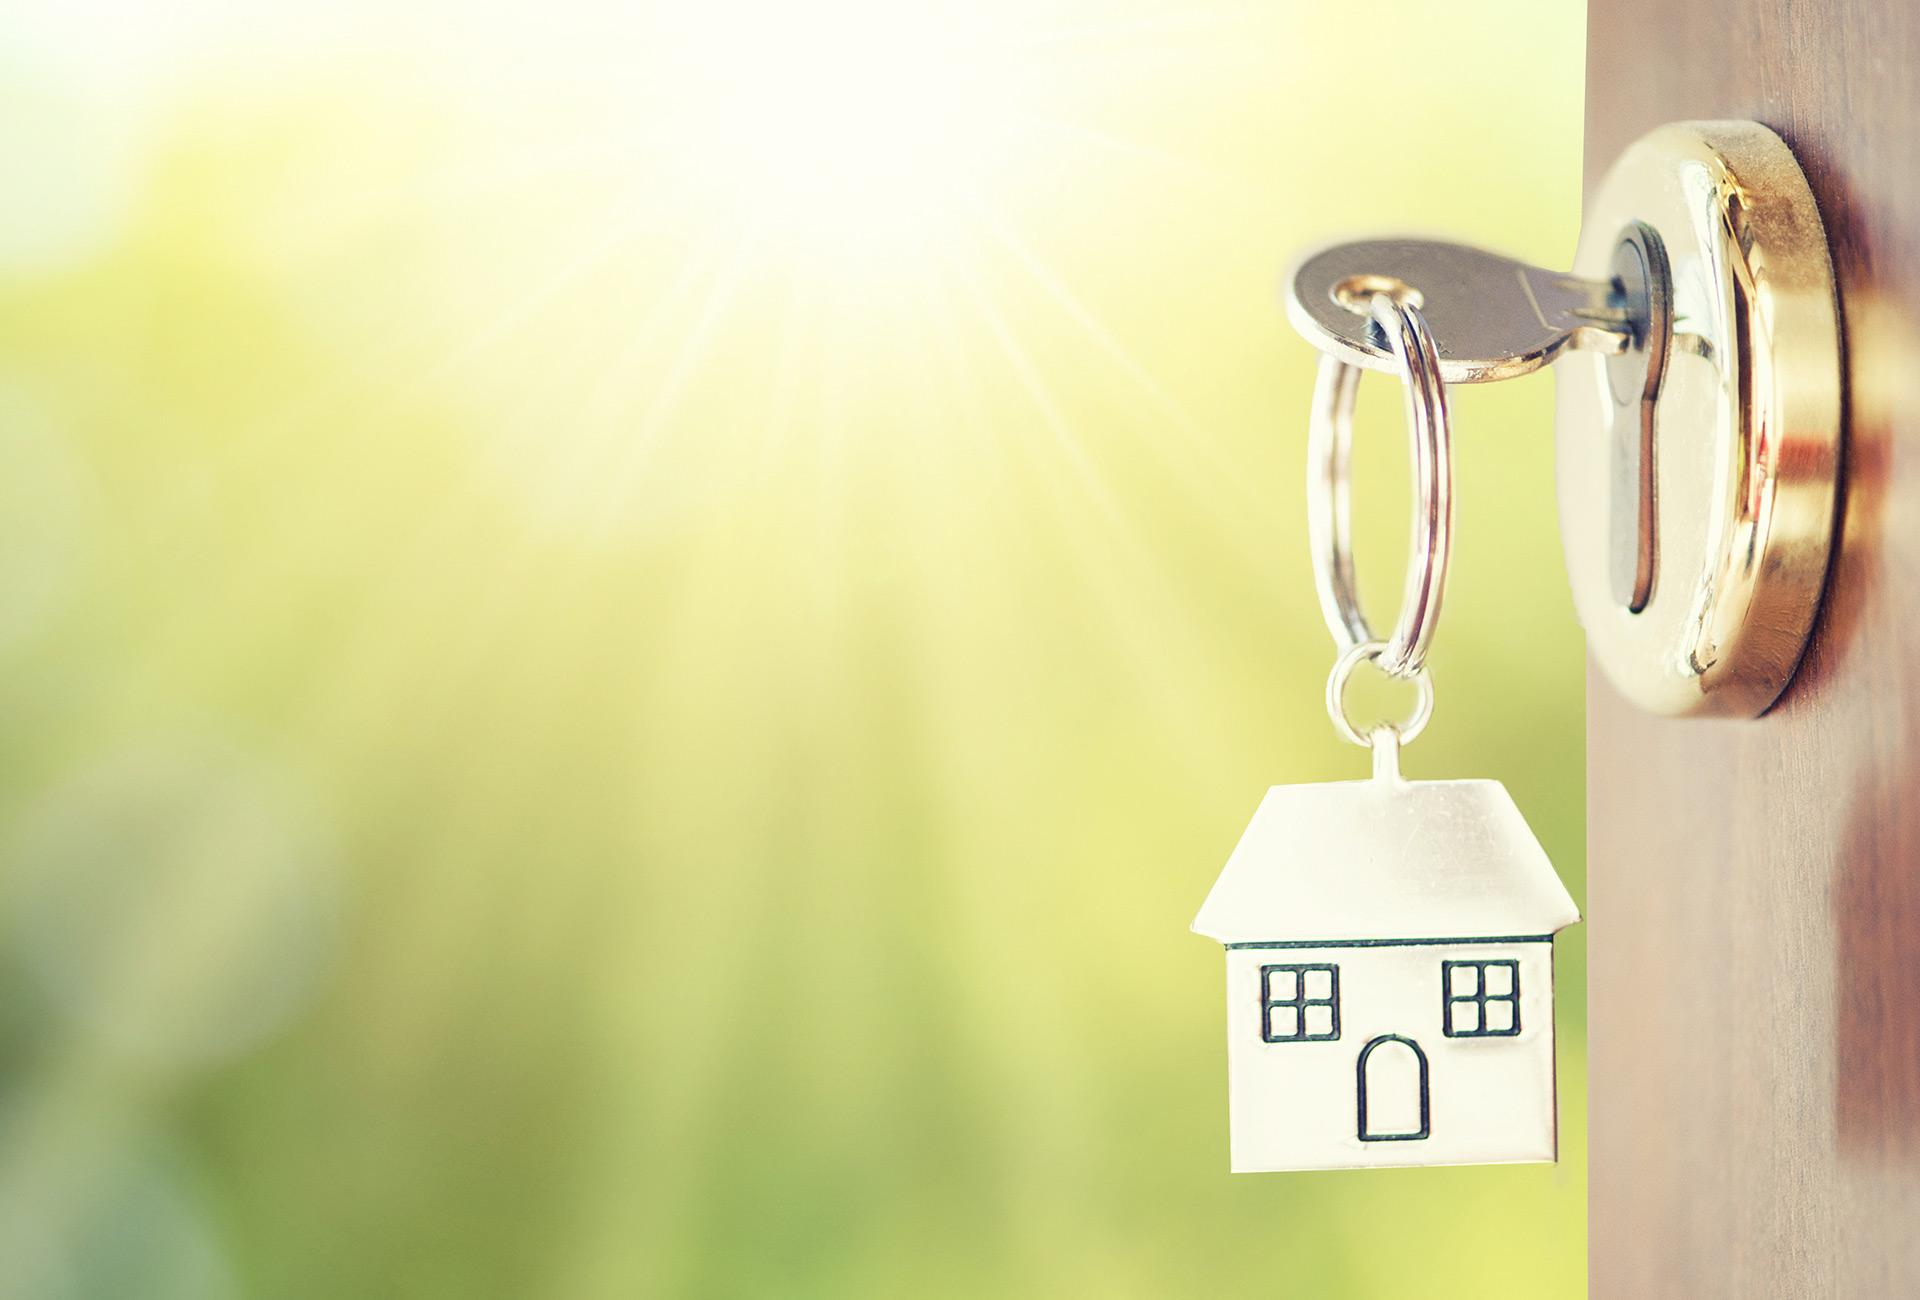 Waarom kiezen om sleutel-op-de-deur te bouwen?